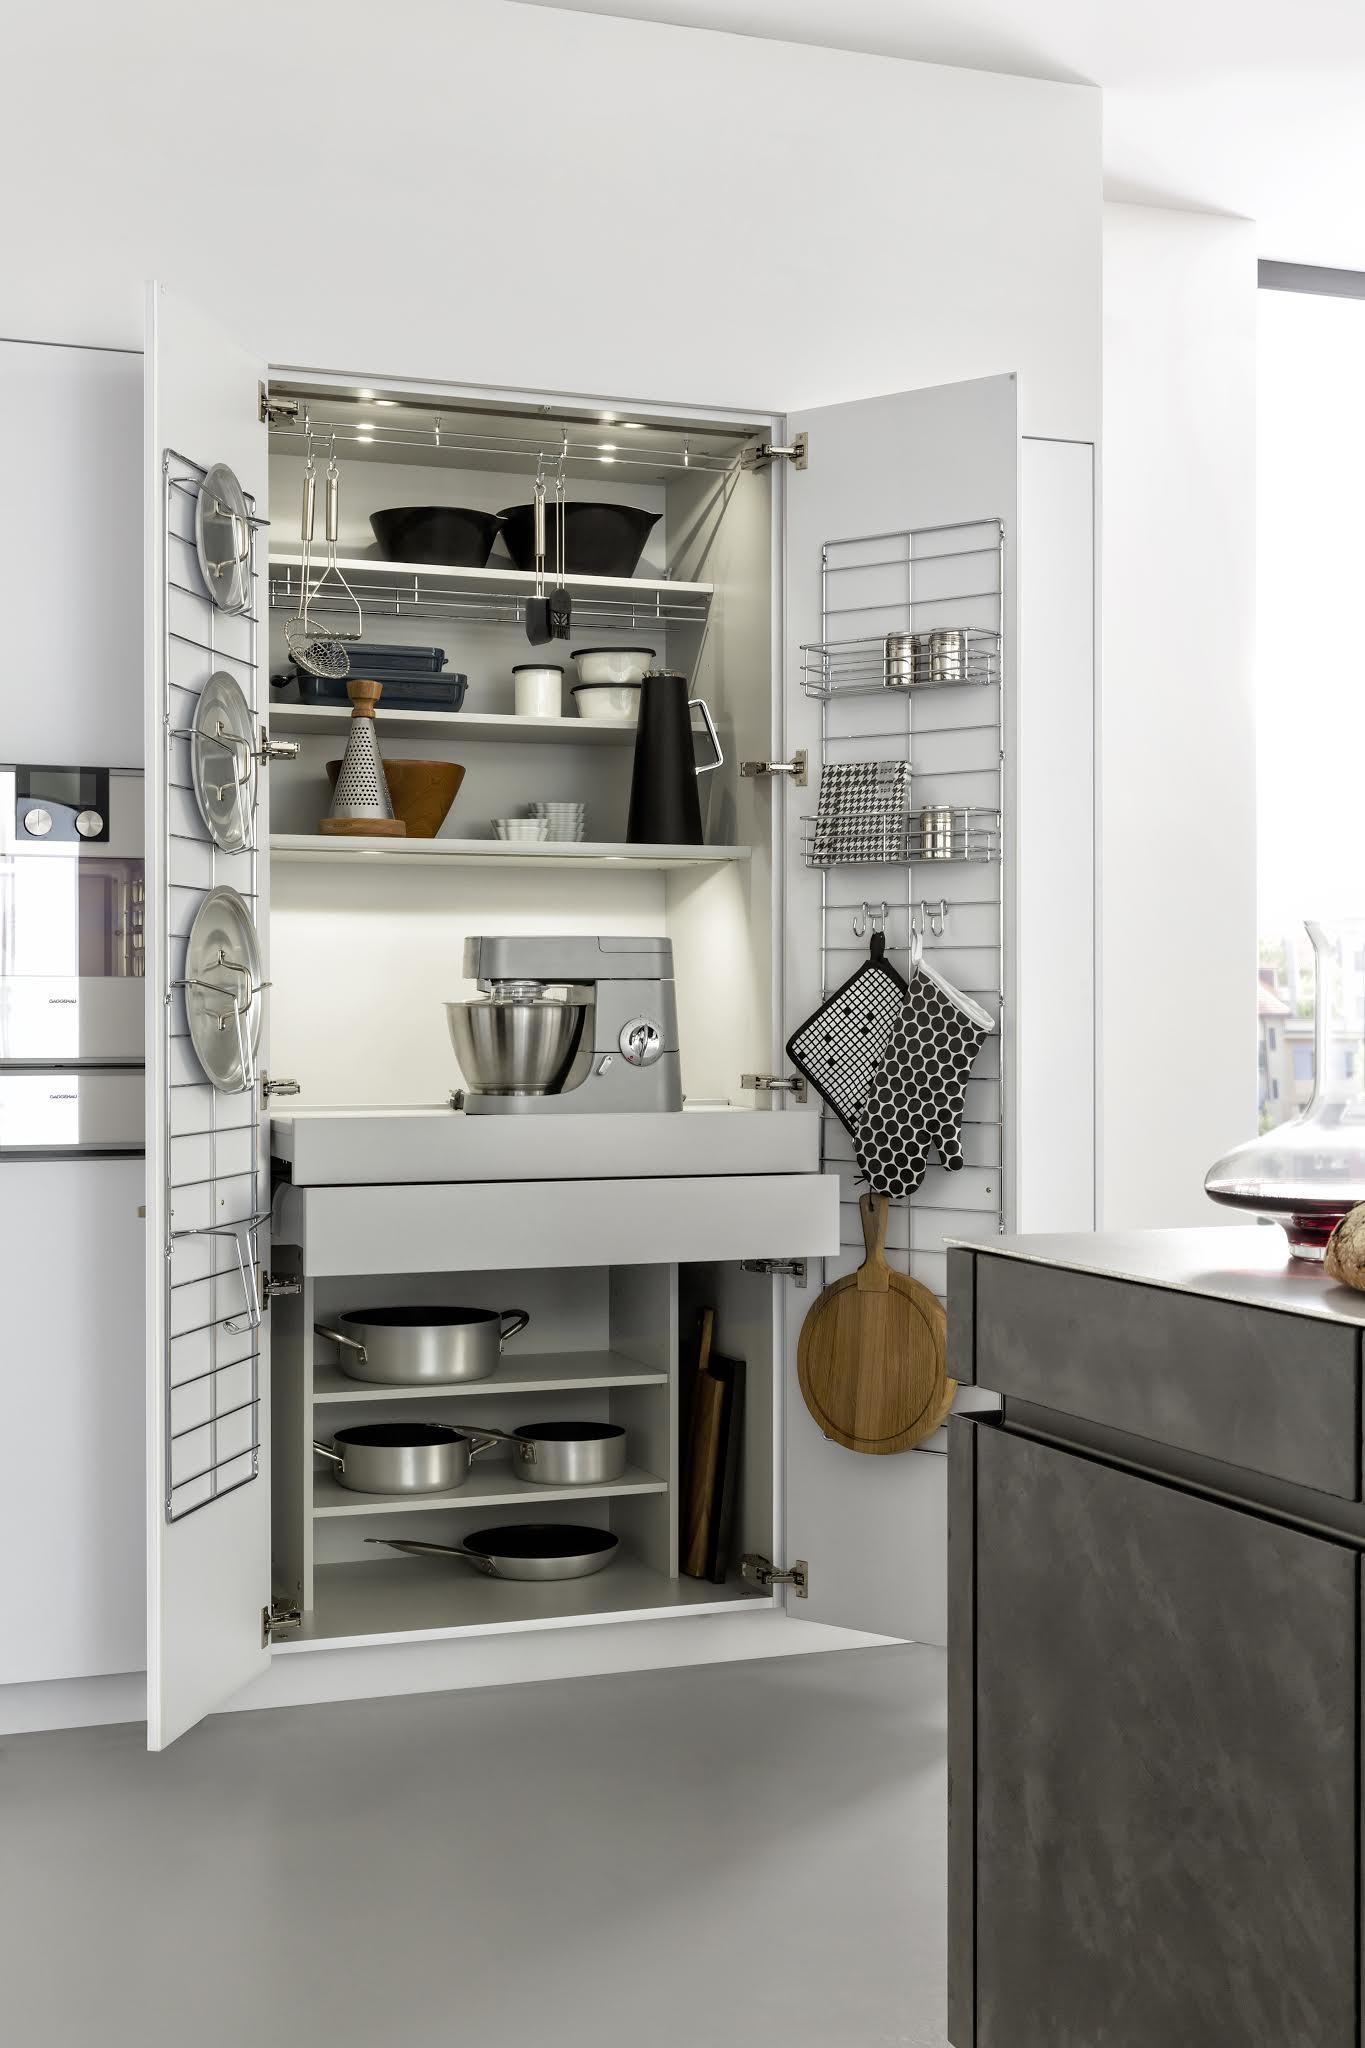 szafki w kuchni organizacja